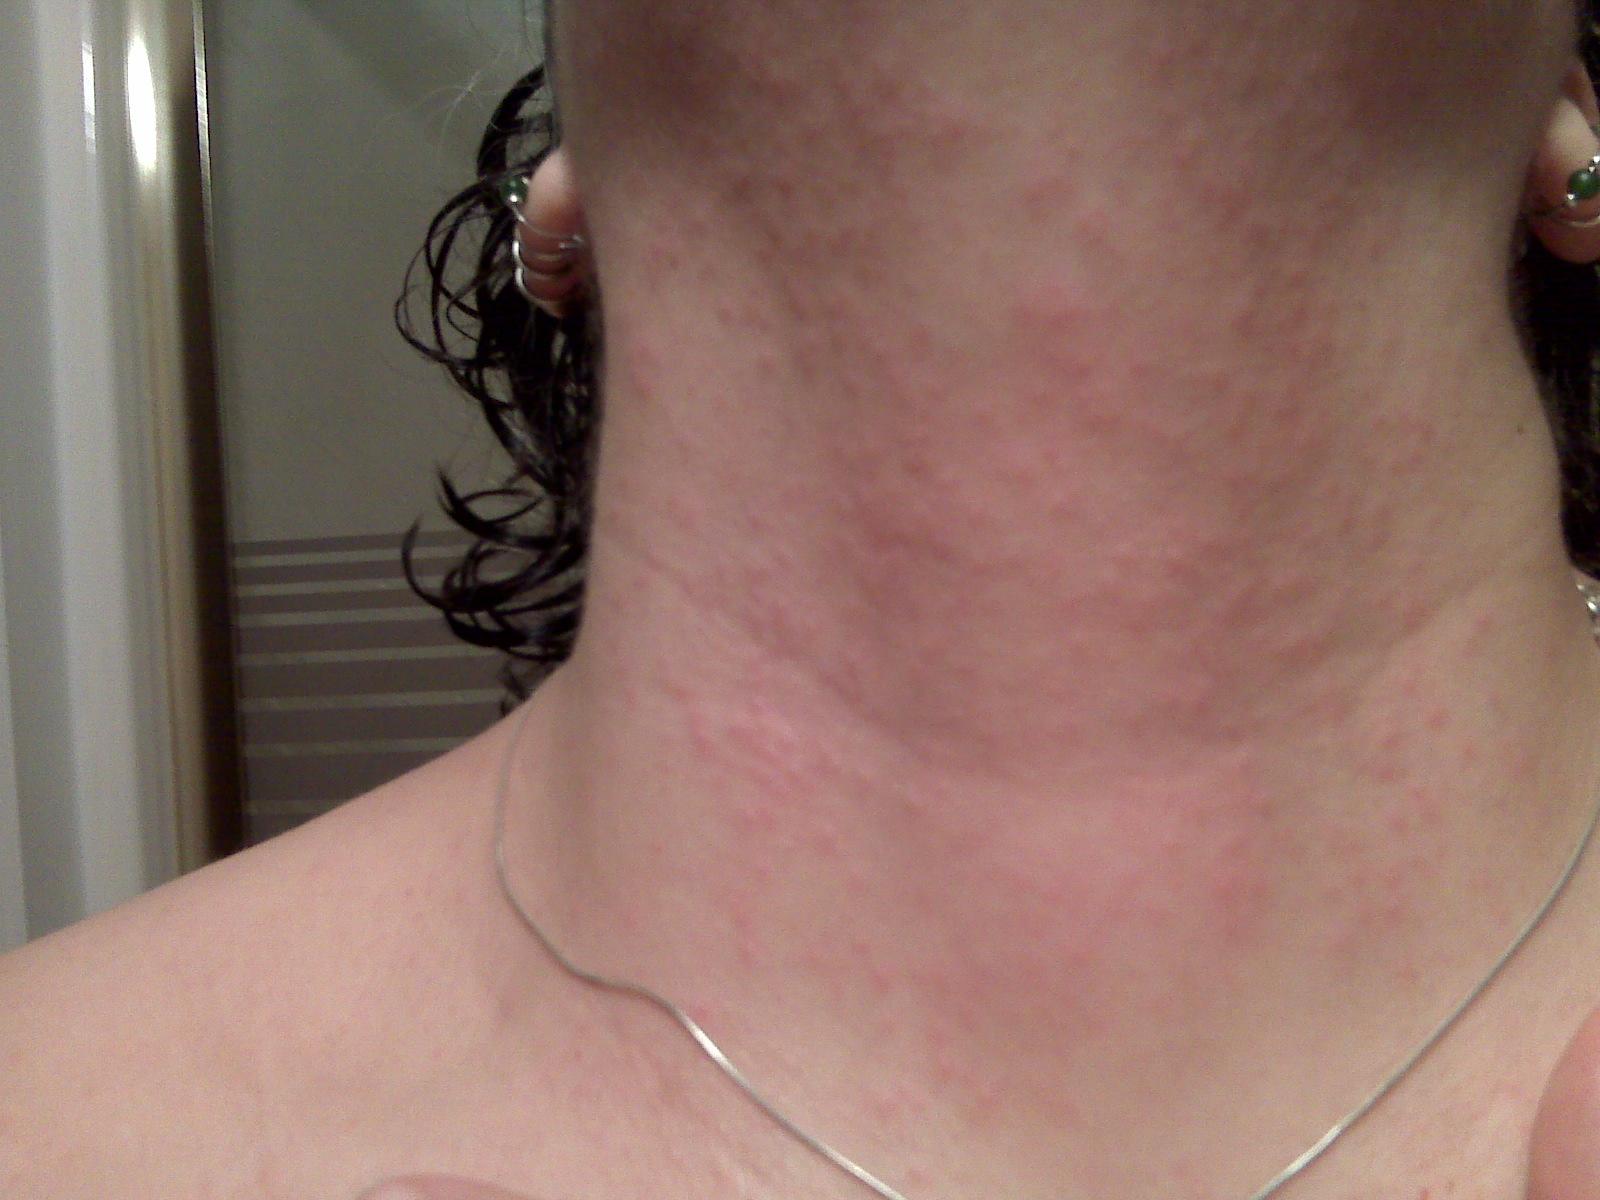 Diagnose My Skin Rash - Healthy Skin Care